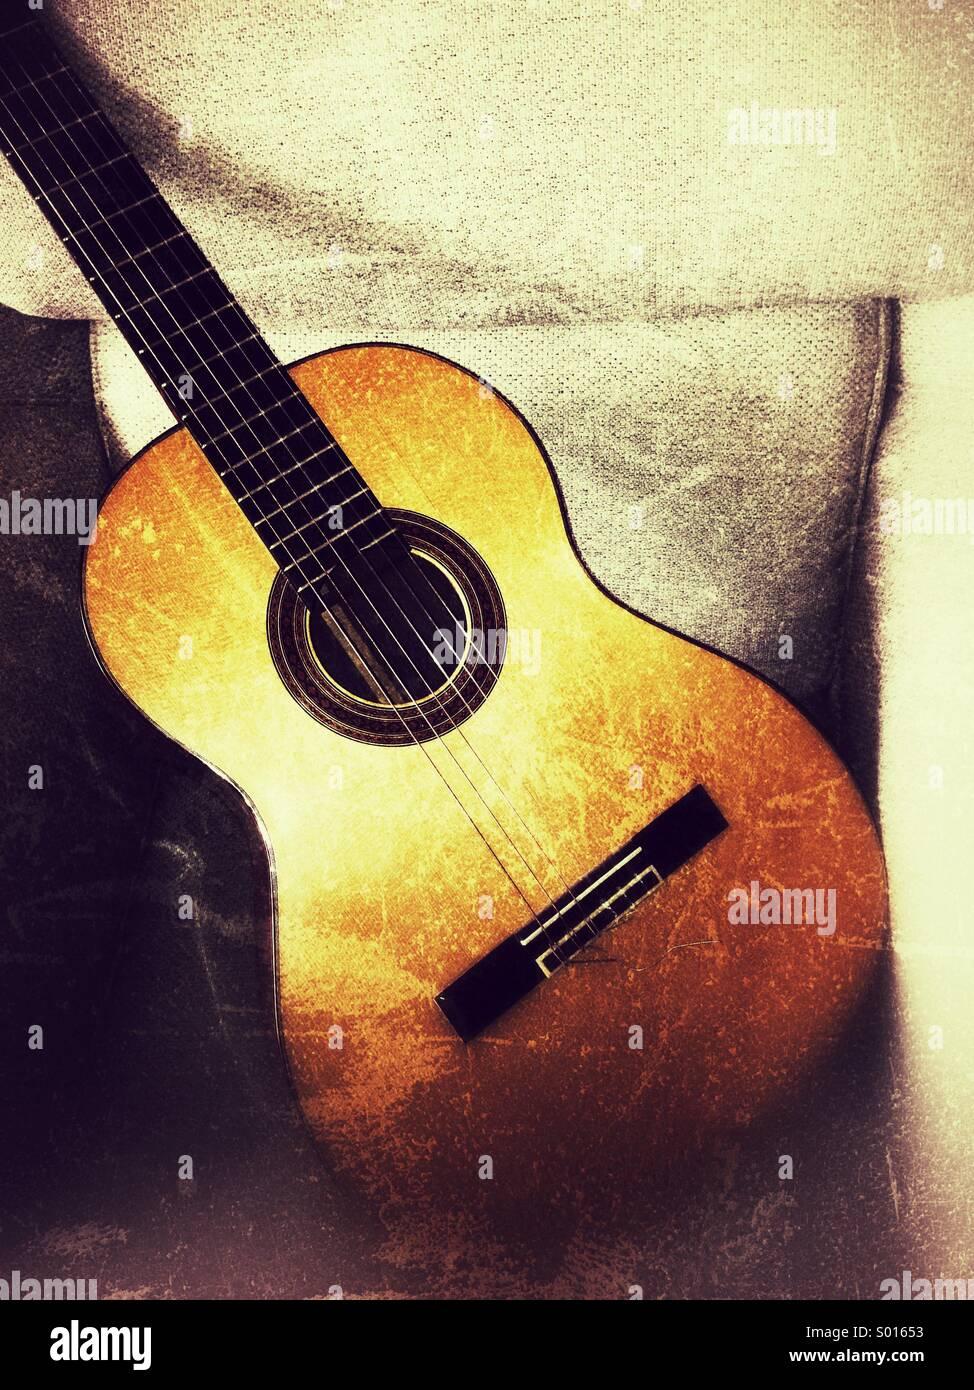 Classical guitar - Stock Image